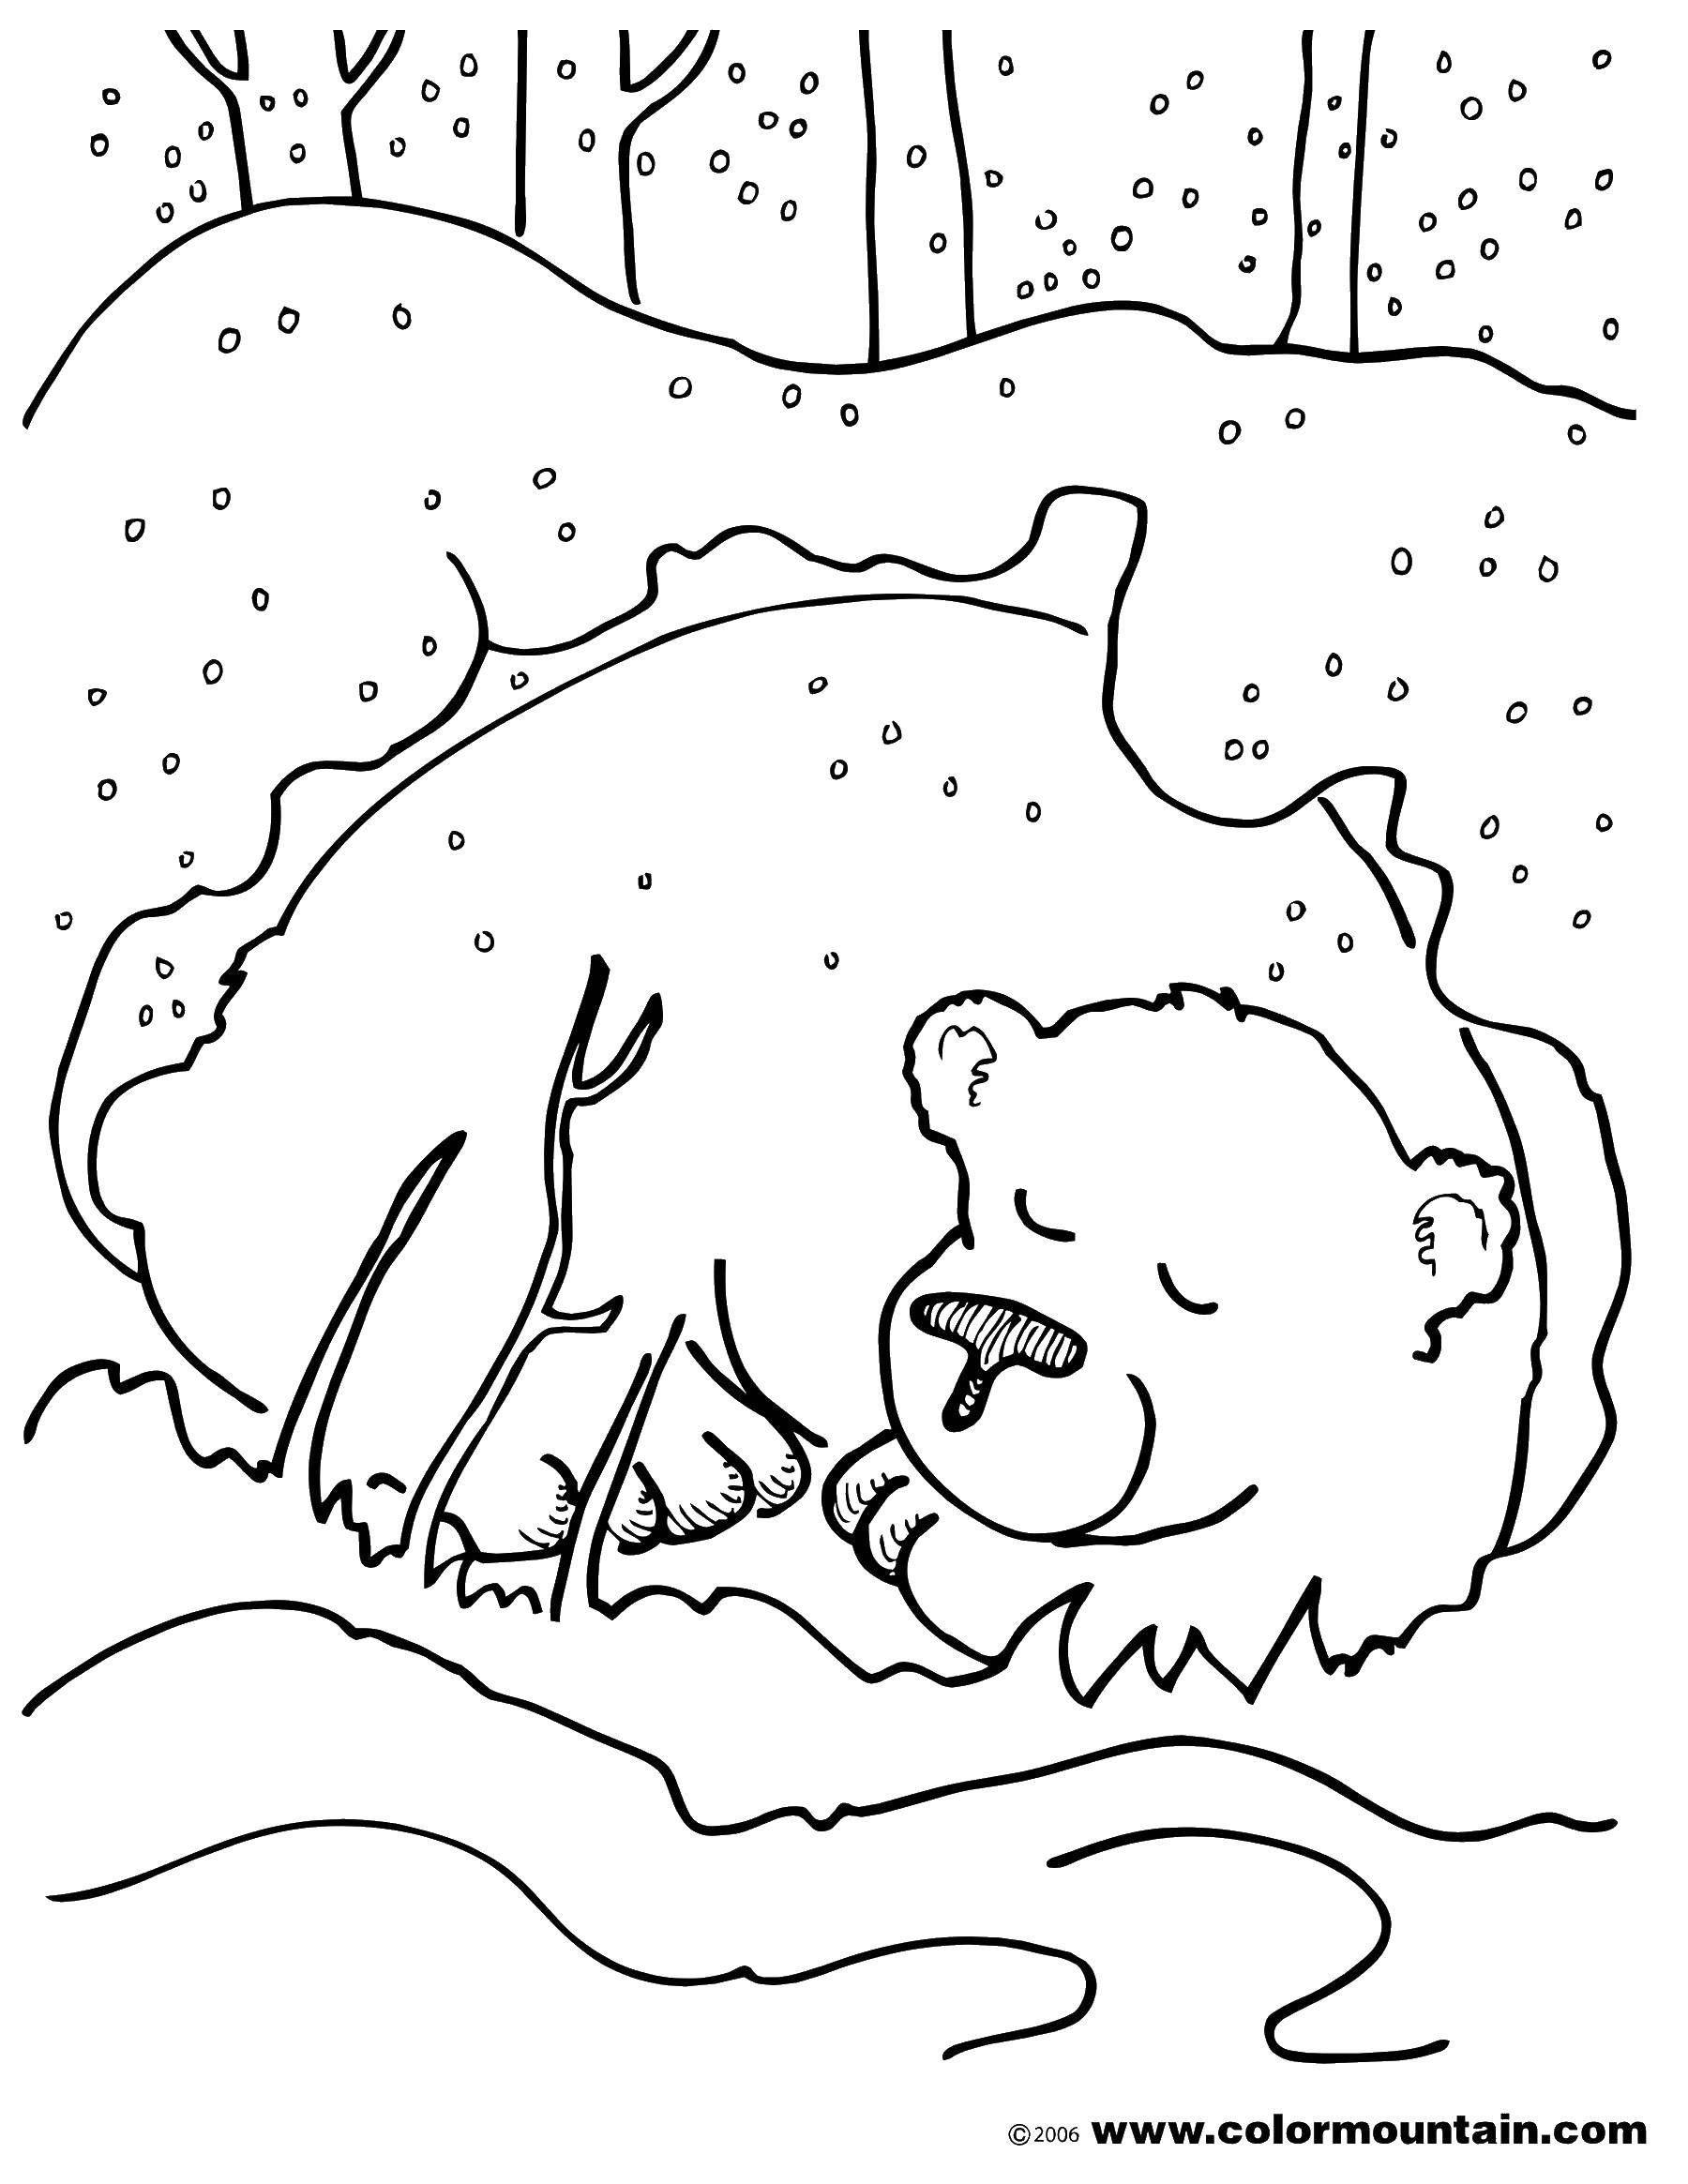 Kartinki Po Zaprosu Spyashij Medved Raskraska Bear Coloring Pages Animal Coloring Pages Coloring Pages Winter